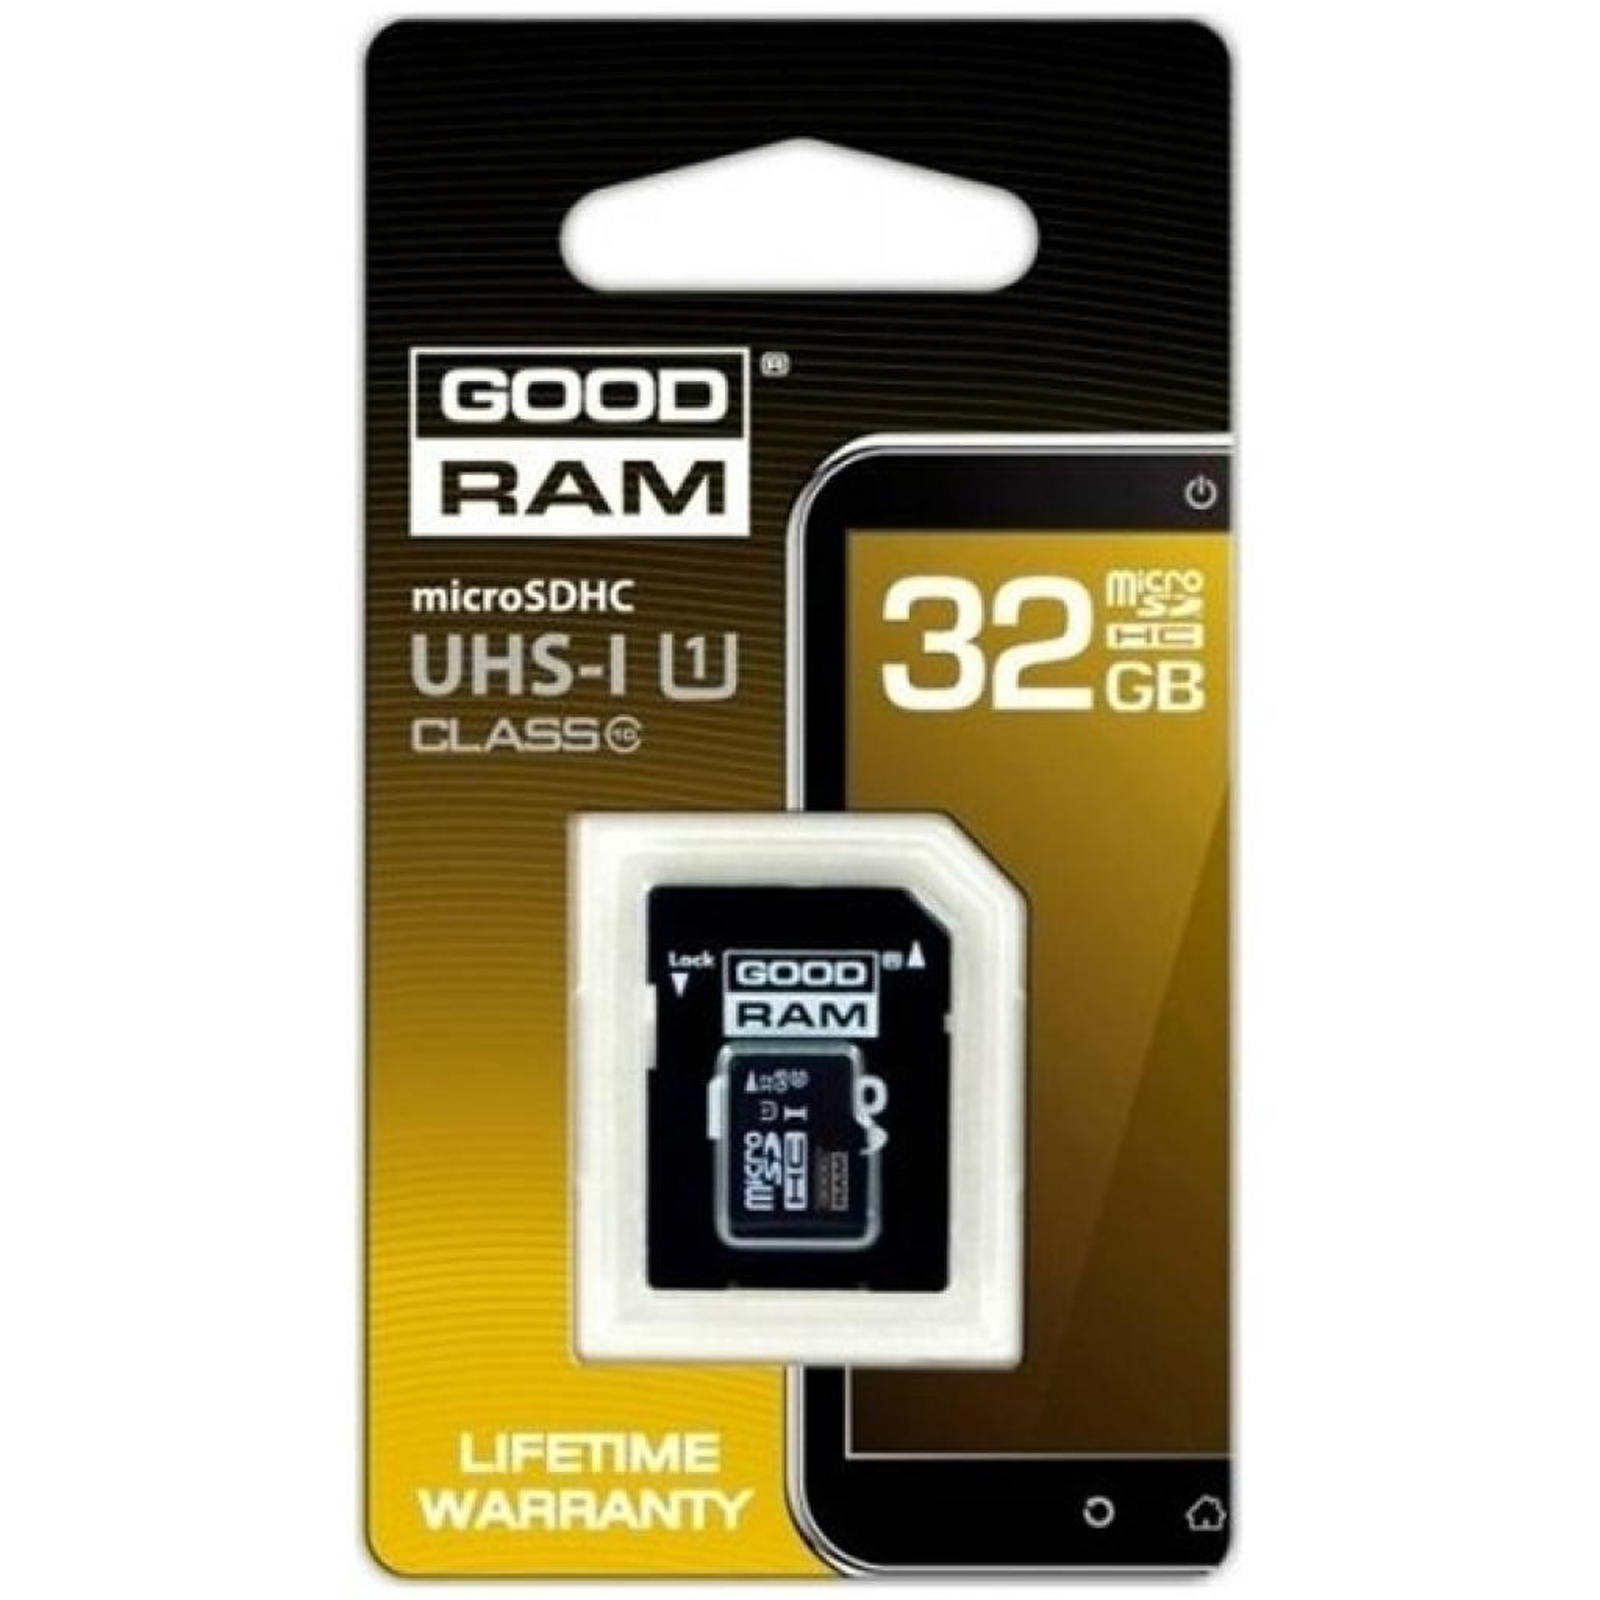 Карта памяти GOODRAM 32GB microSDHC Class 10 (M1AA-0320R11) изображение 2